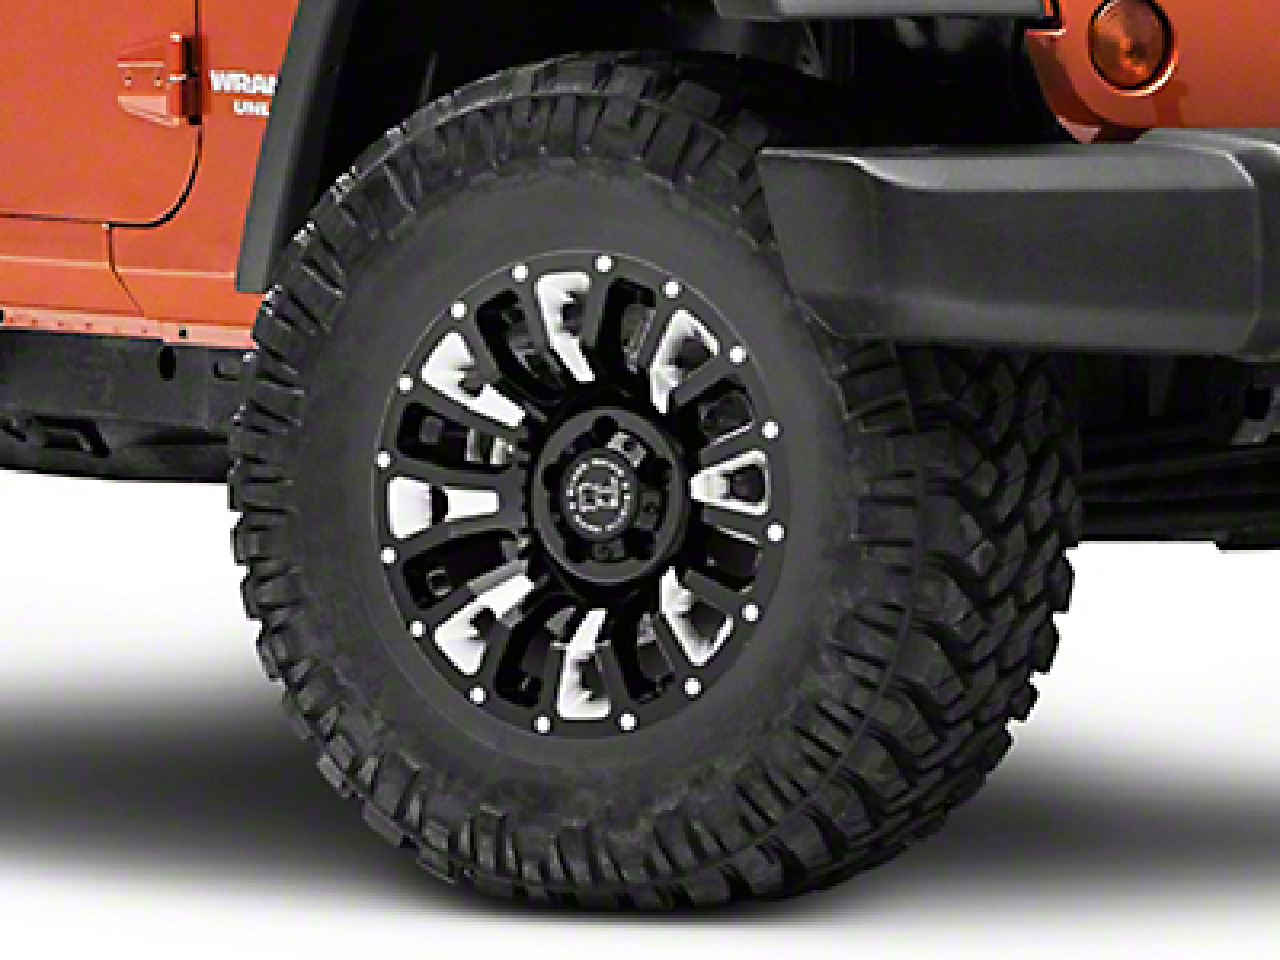 Black Rhino Pinatubo Gloss Black Wheel - 17x9.5 (07-18 Jeep Wrangler JK; 2018 Jeep Wrangler JL)